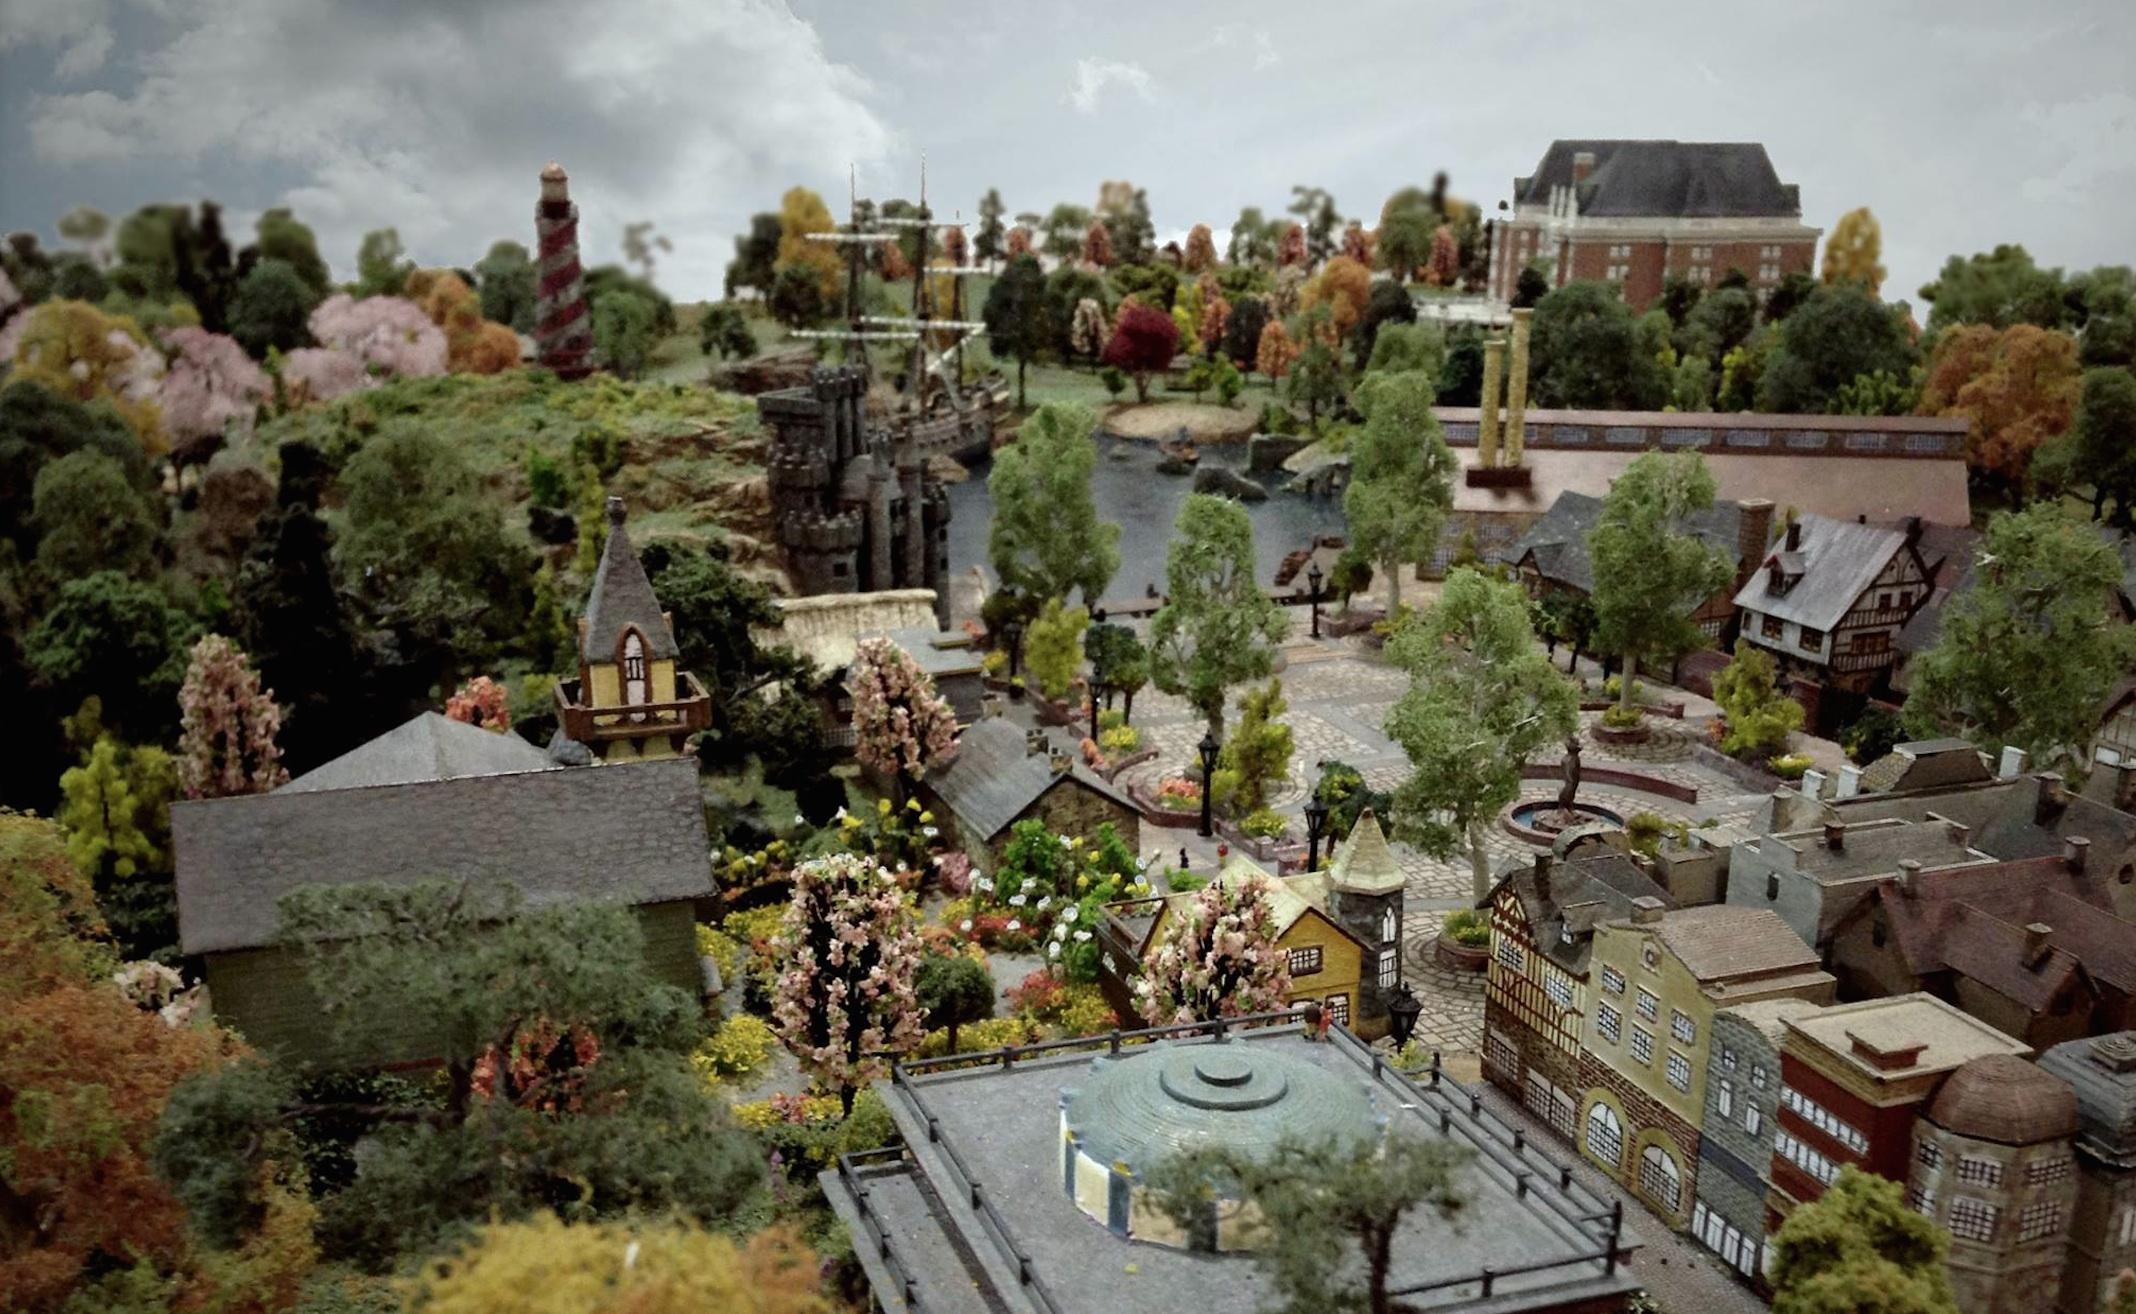 Ksl Com Cars >> New Utah theme park will be interactive and immersive | KSL.com